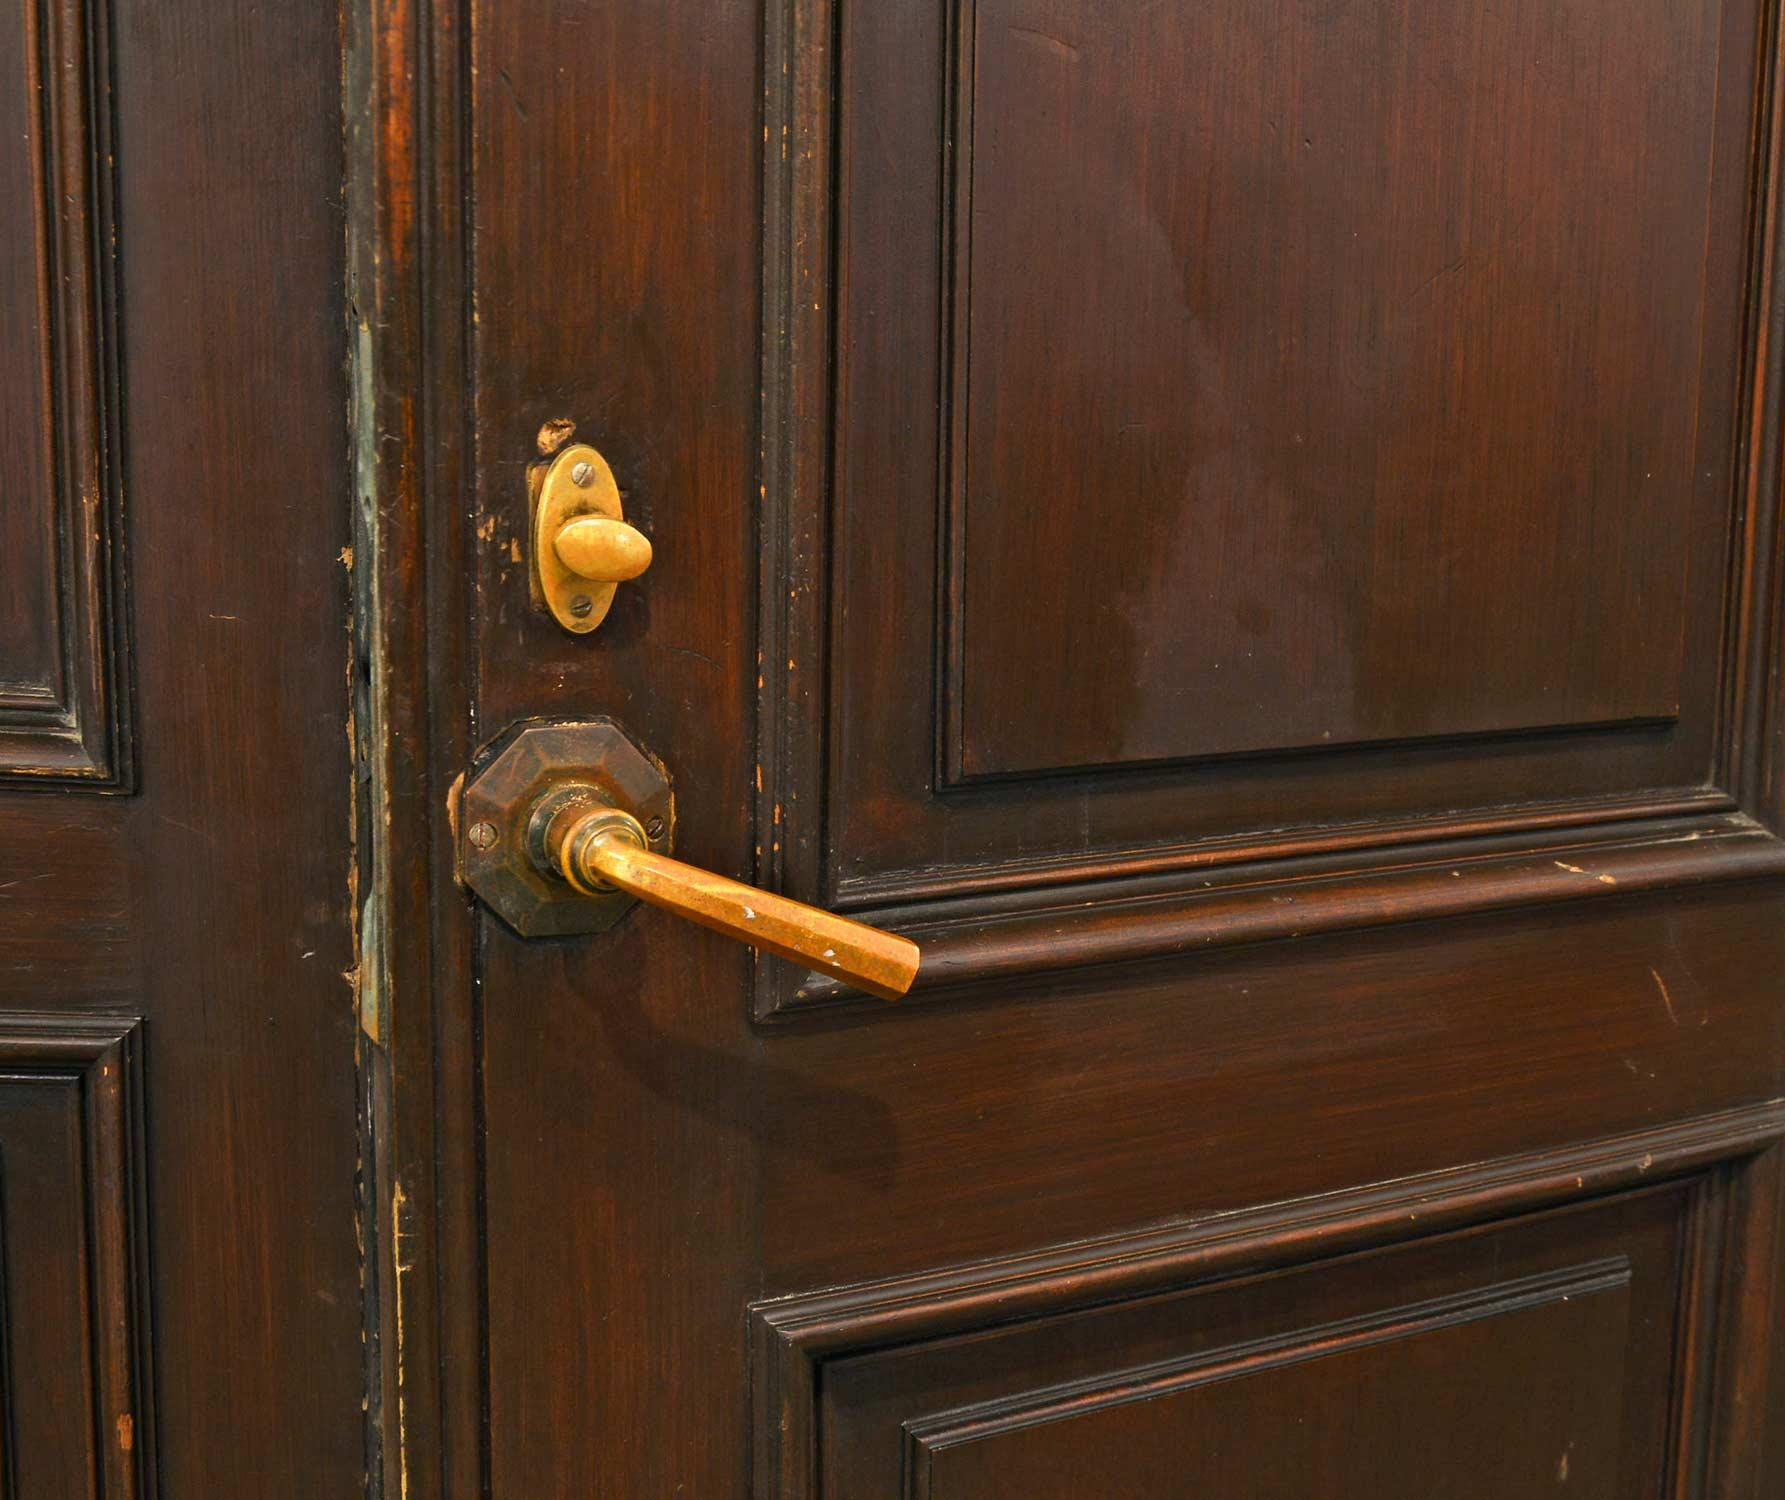 46248-arched-door-with-jamb-hardware.jpg